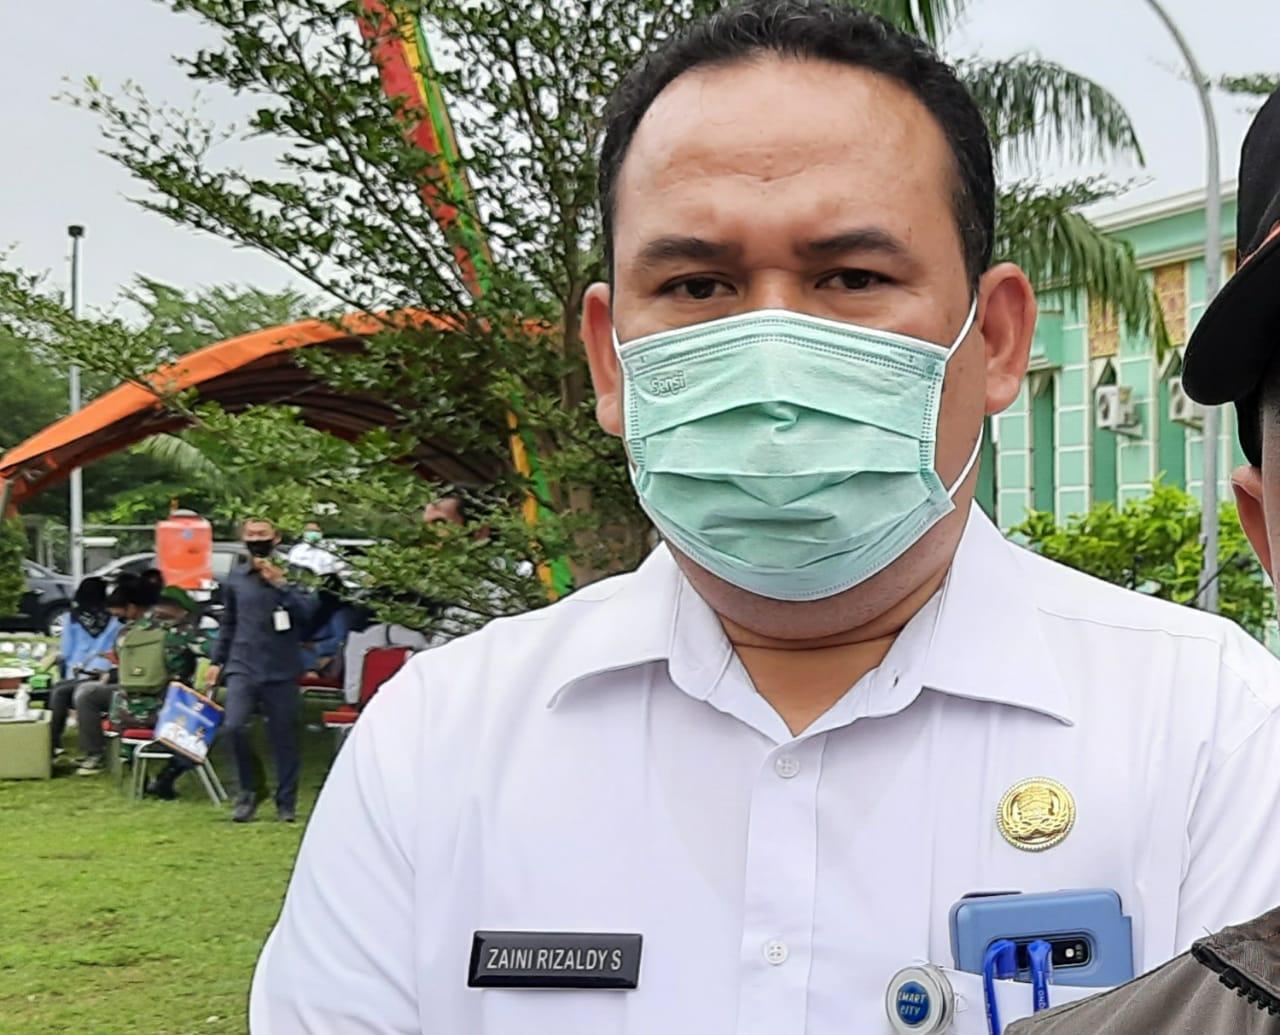 Dinkes Pekanbaru Pastikan Mayoritas Nakes Sudah Disuntik Vaksin Covid-19